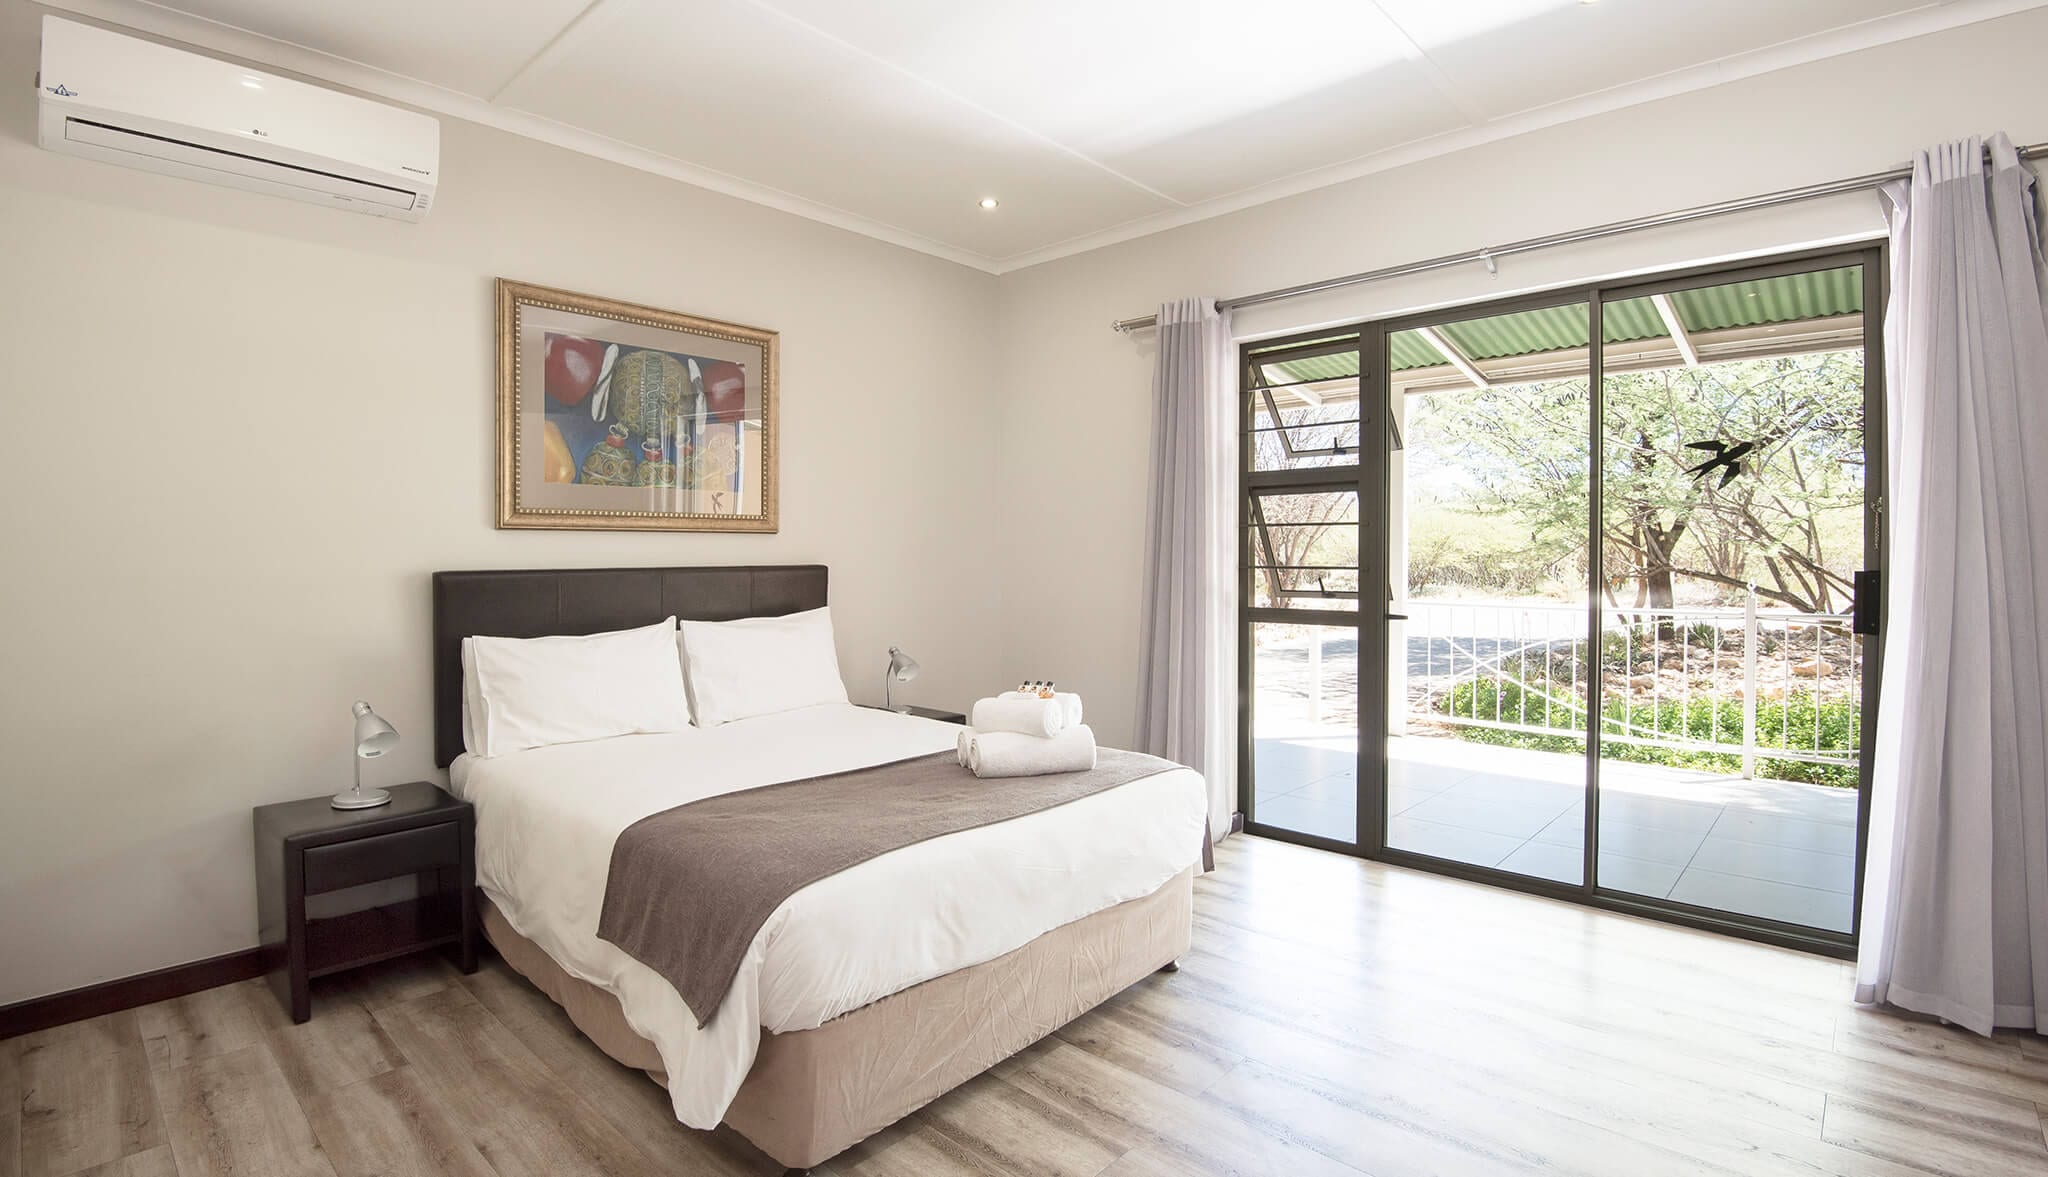 Arebbusch Travel Lodge windhoek best budget hotels